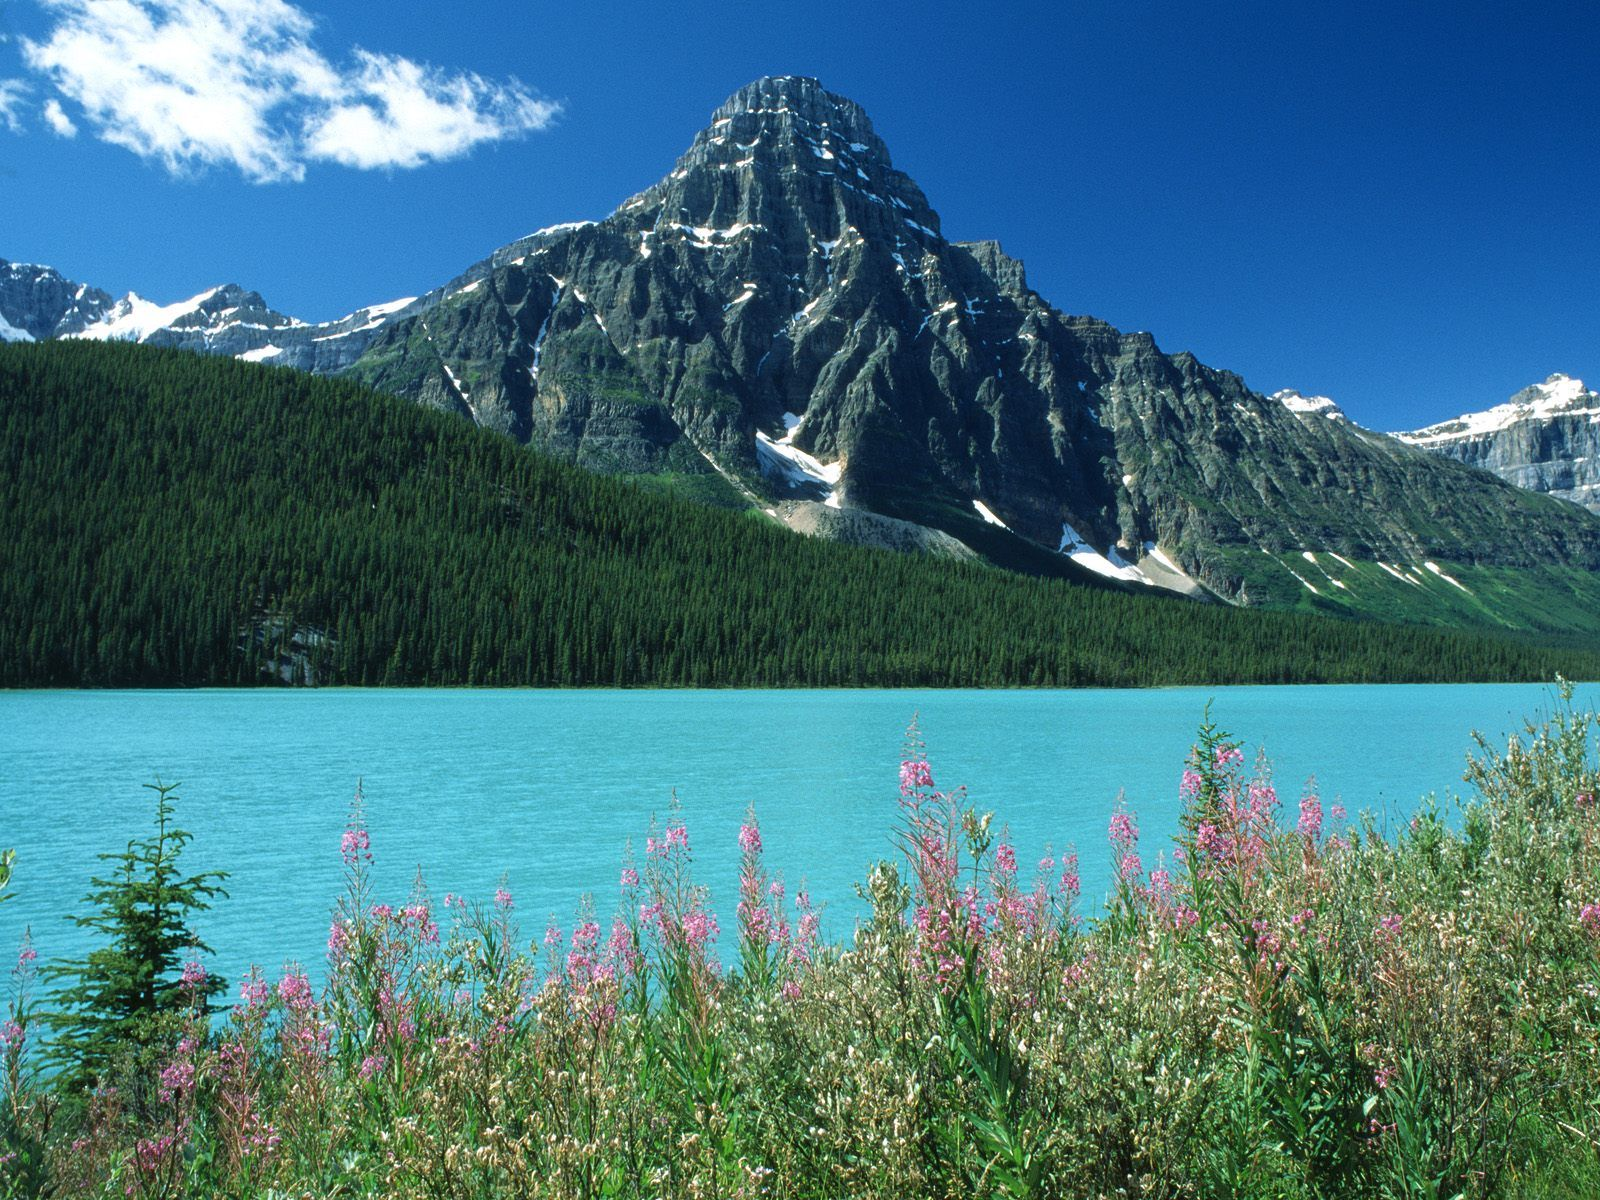 The Winston Churchill Range Is A Mountain Range In The